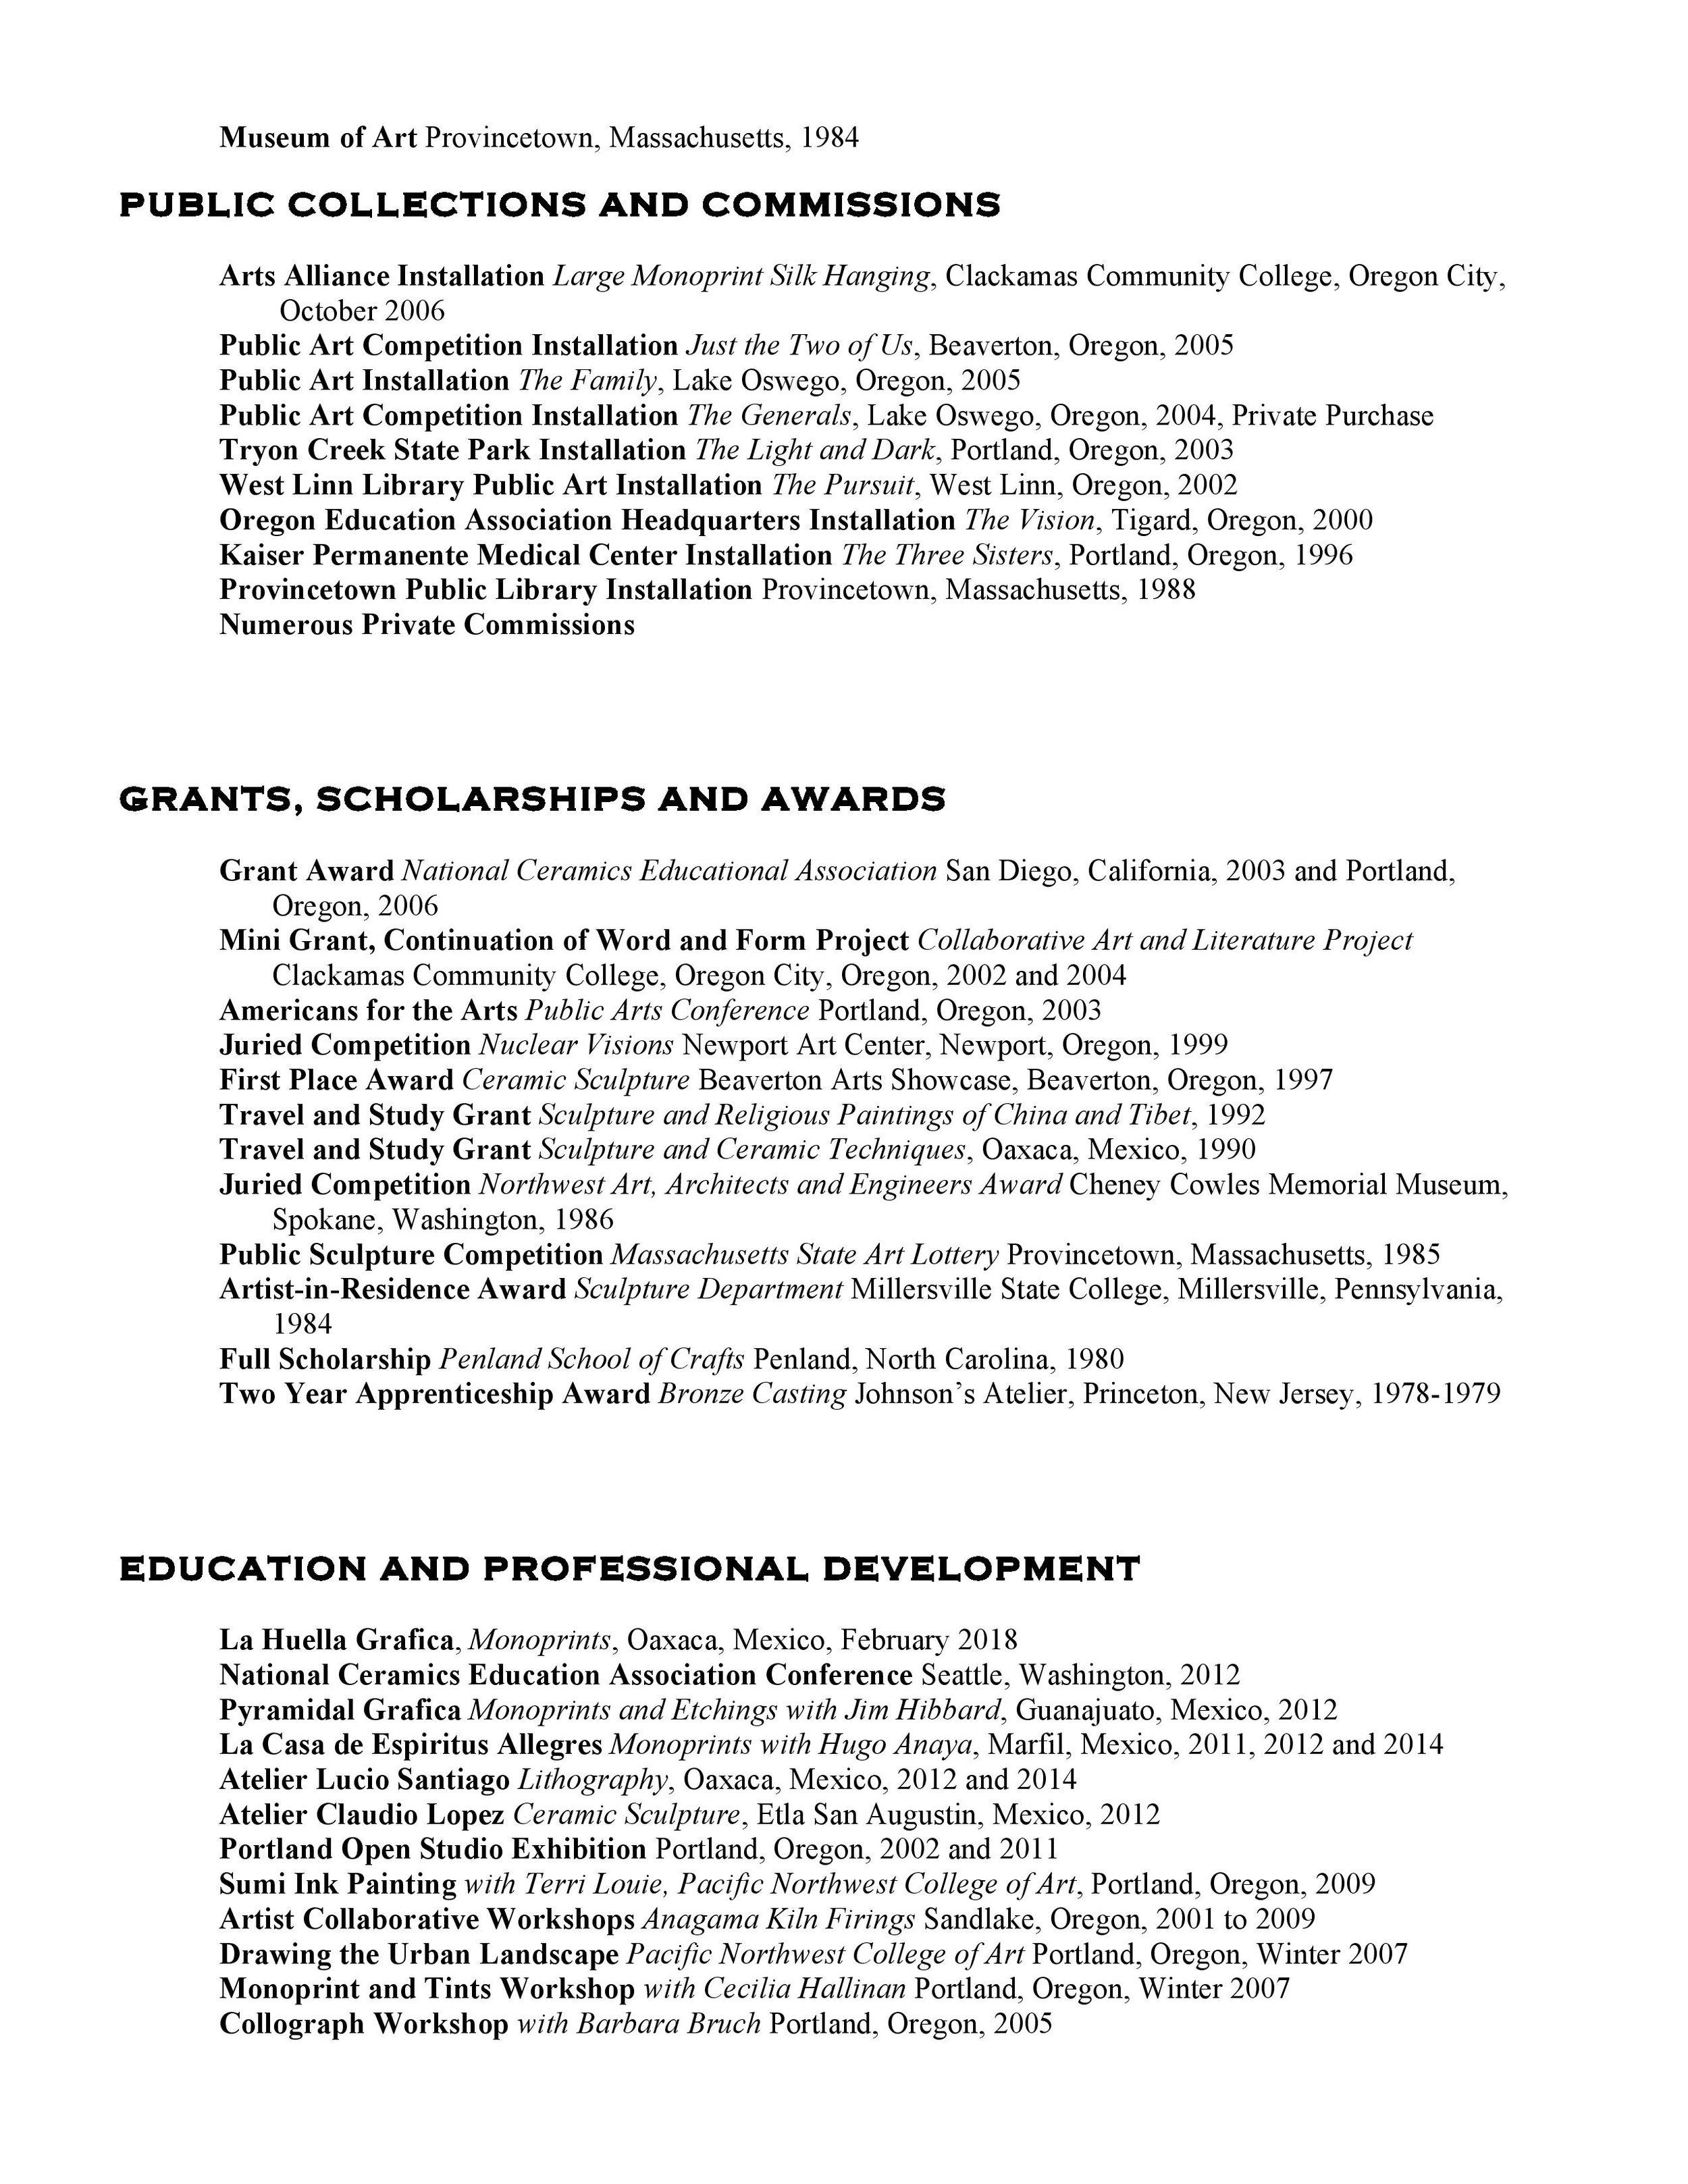 Resume_4-18-page-002(1).jpg